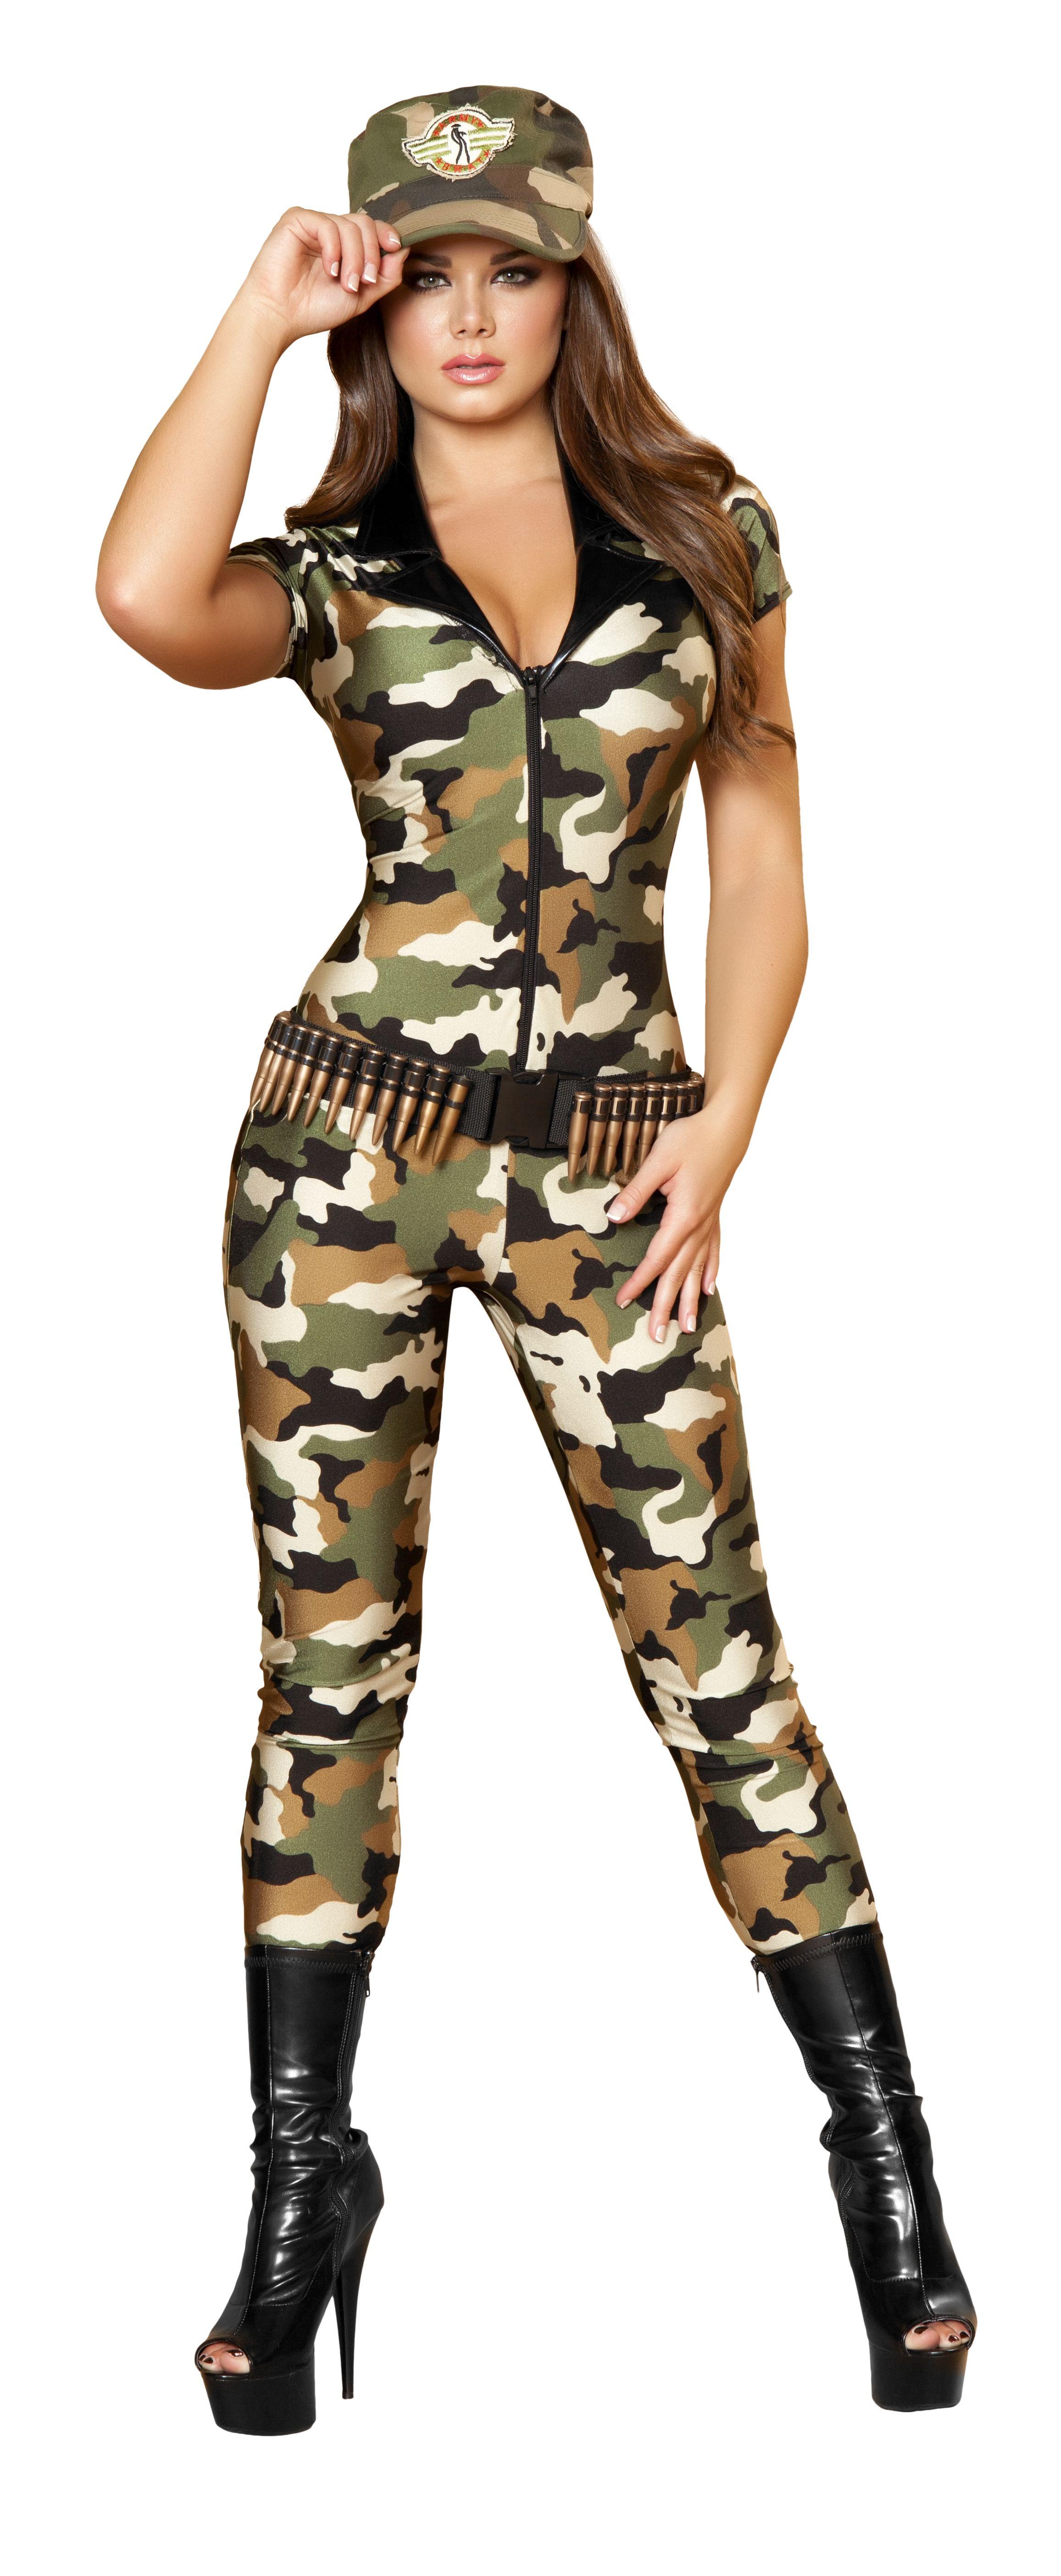 Two piece Camo Cutie Halloween Army Costume from Sexy Wear Avenue ...